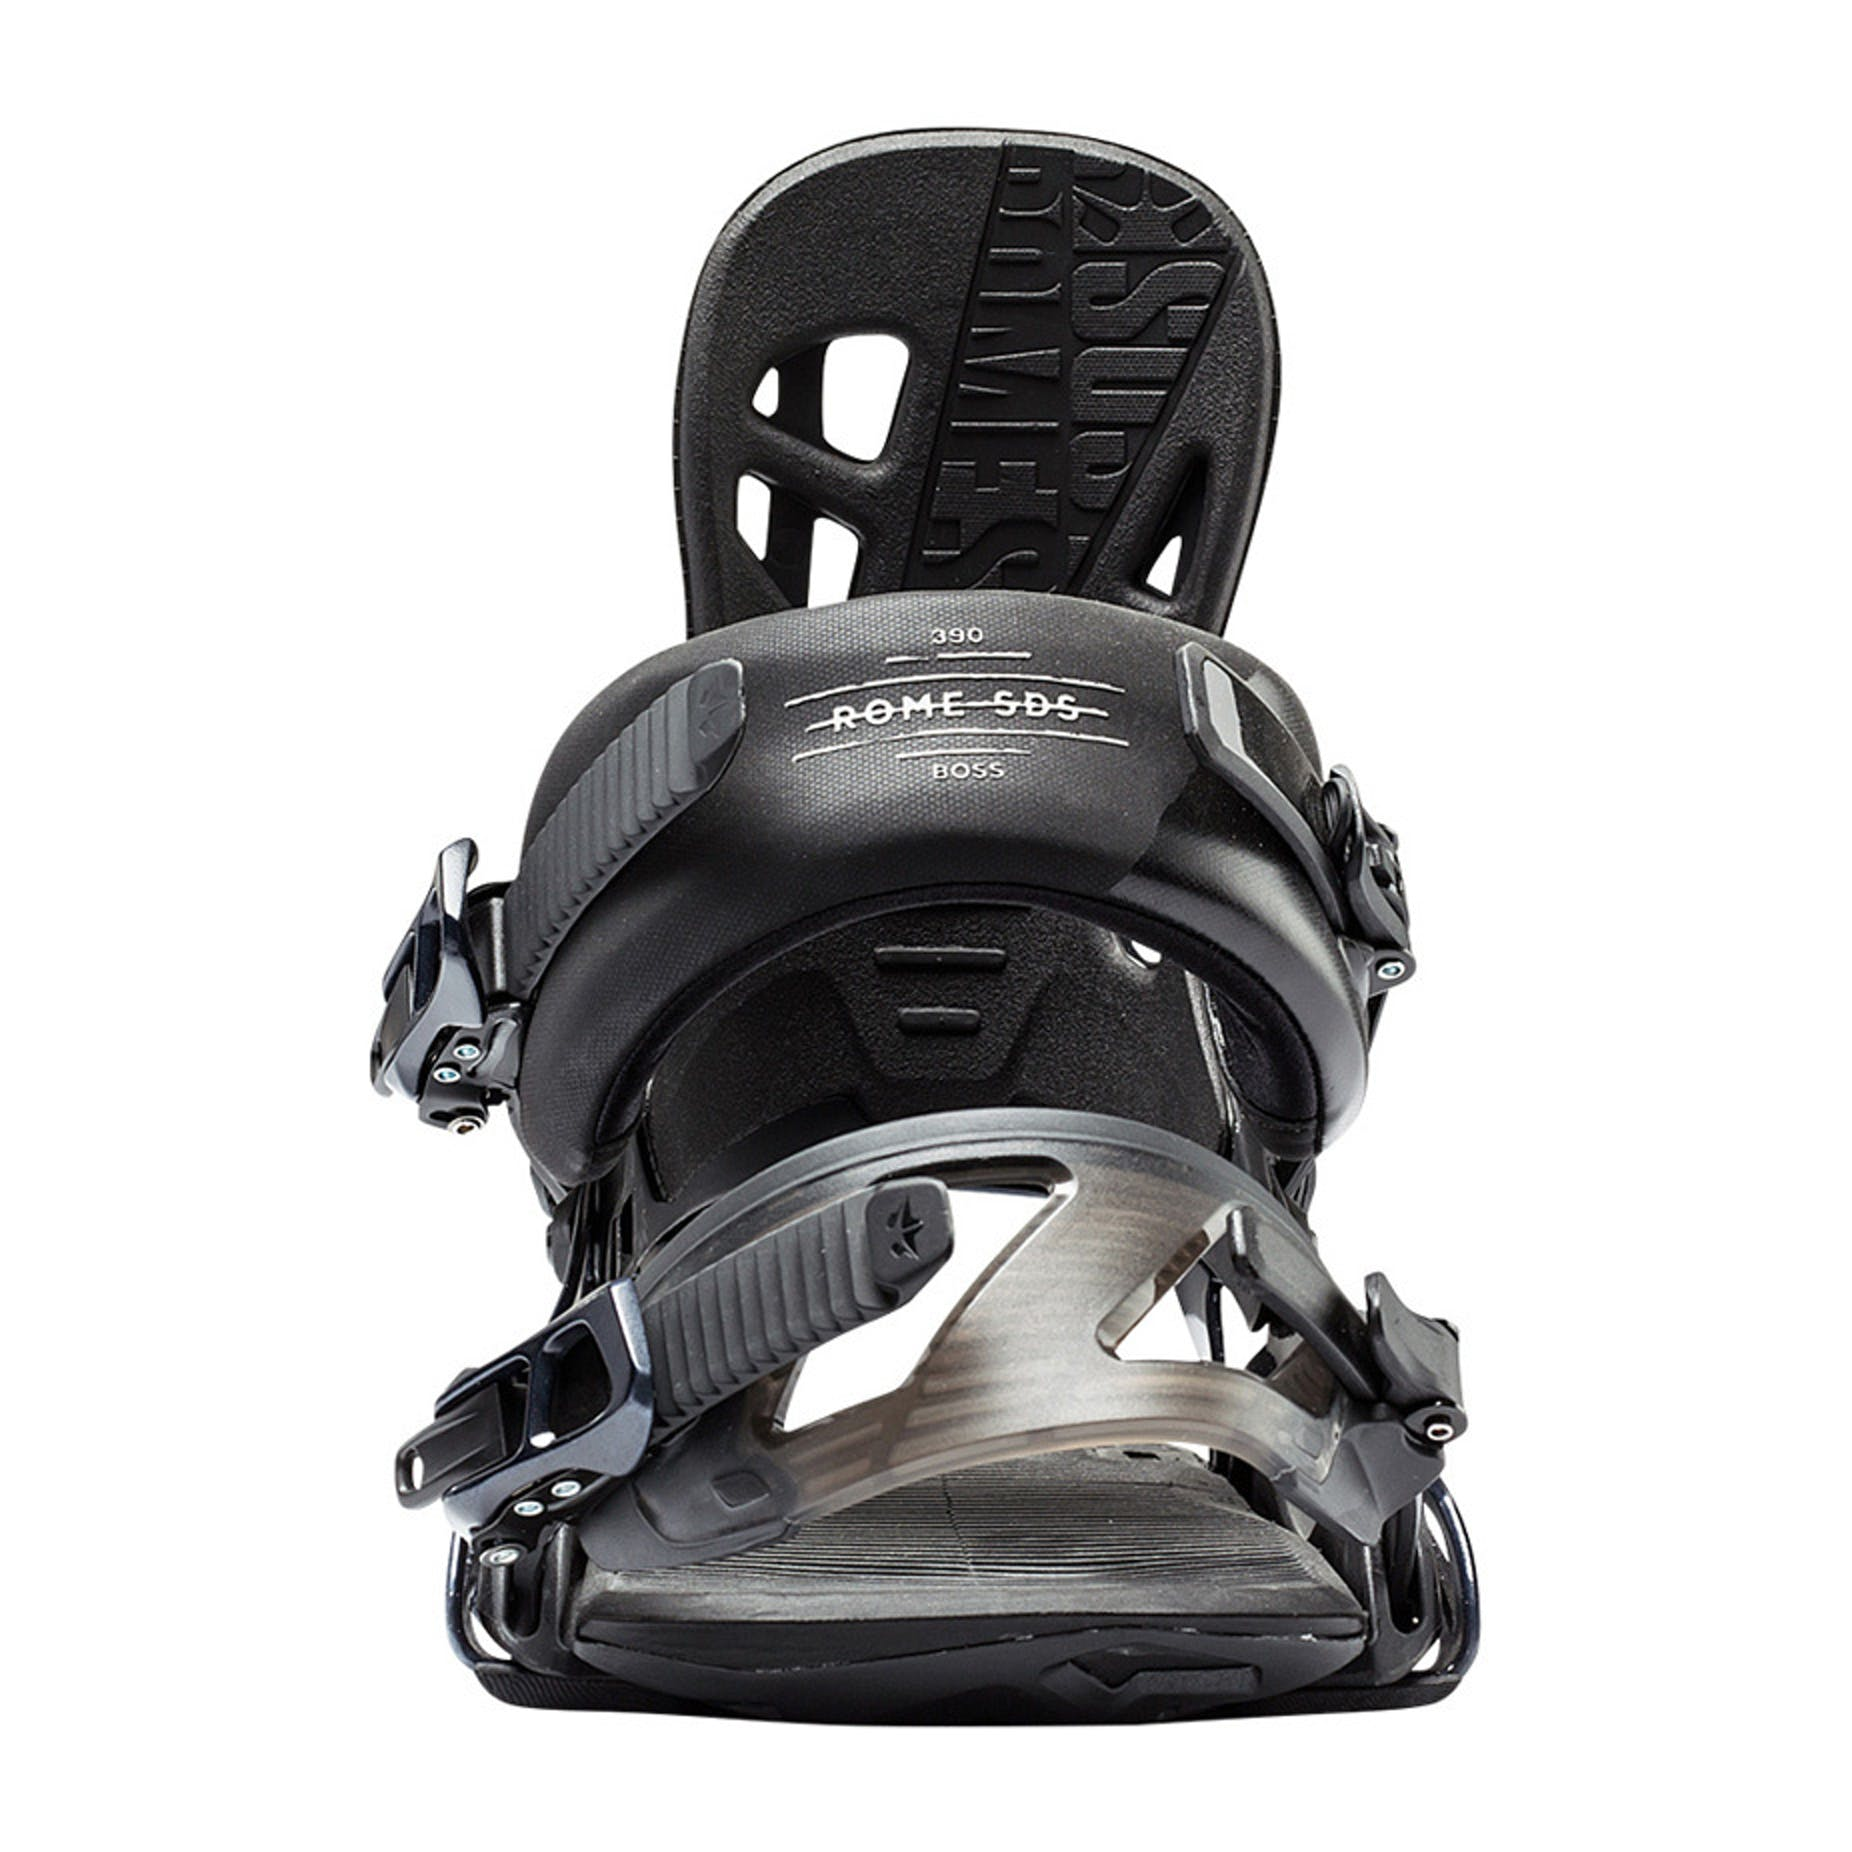 Rome 390 Boss Snowboard Bindings 2017 - Black